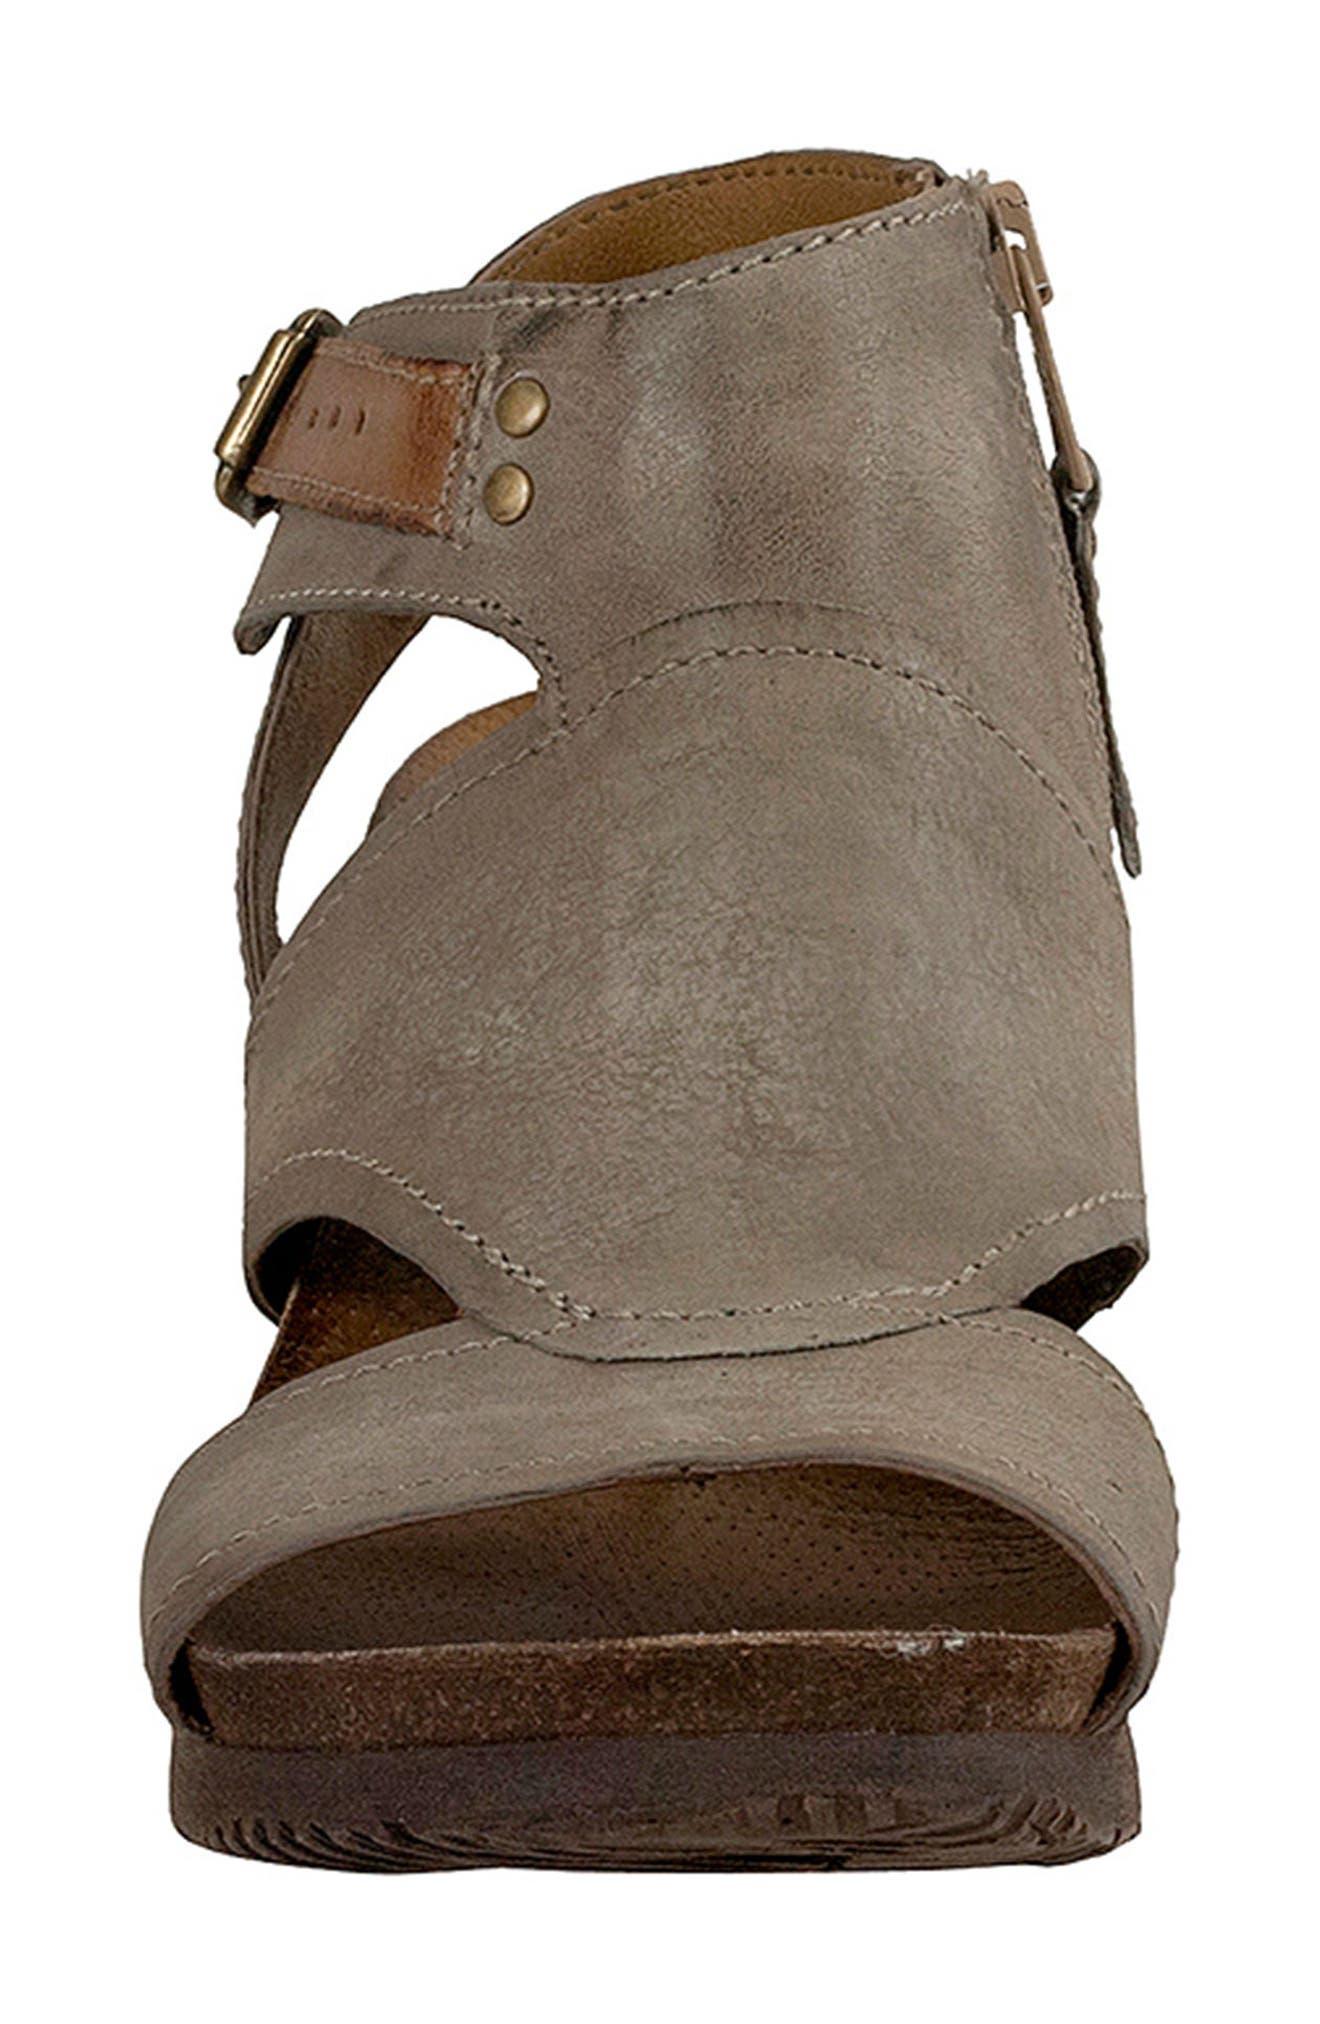 Scout Wedge Sandal,                             Alternate thumbnail 4, color,                             Pebble Leather